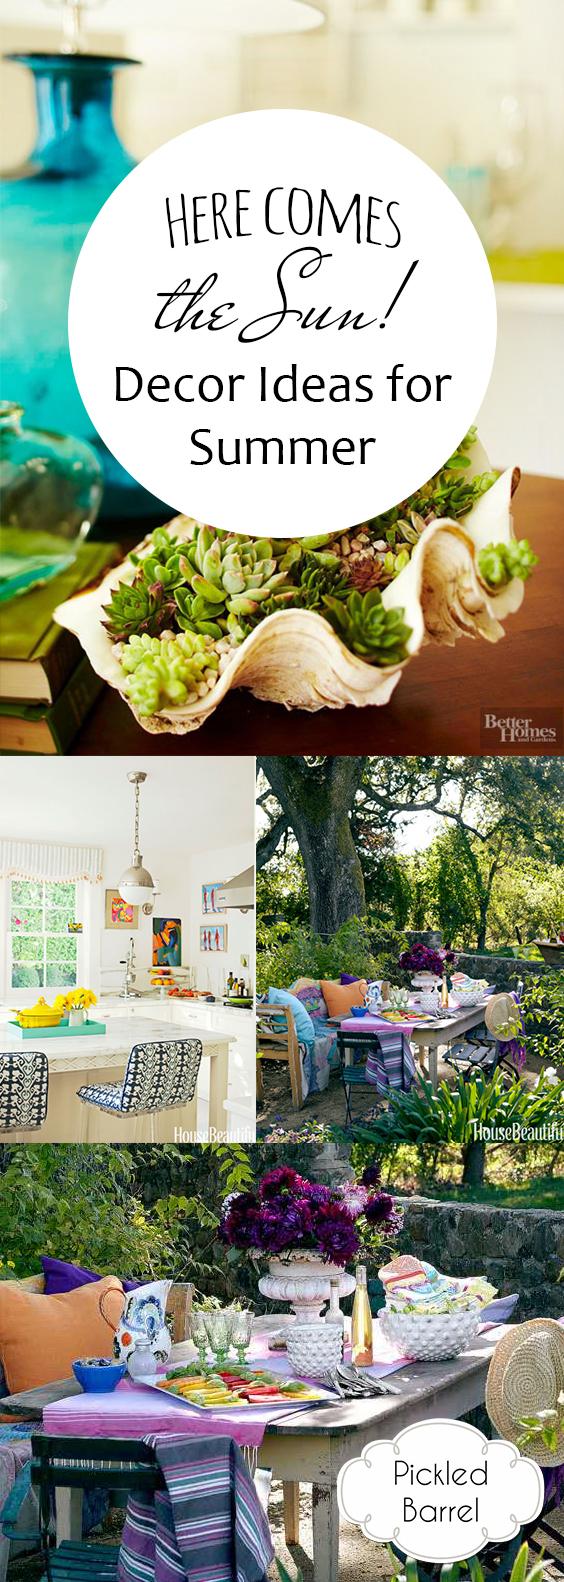 Decor Ideas for Summer – Pickled Barrel